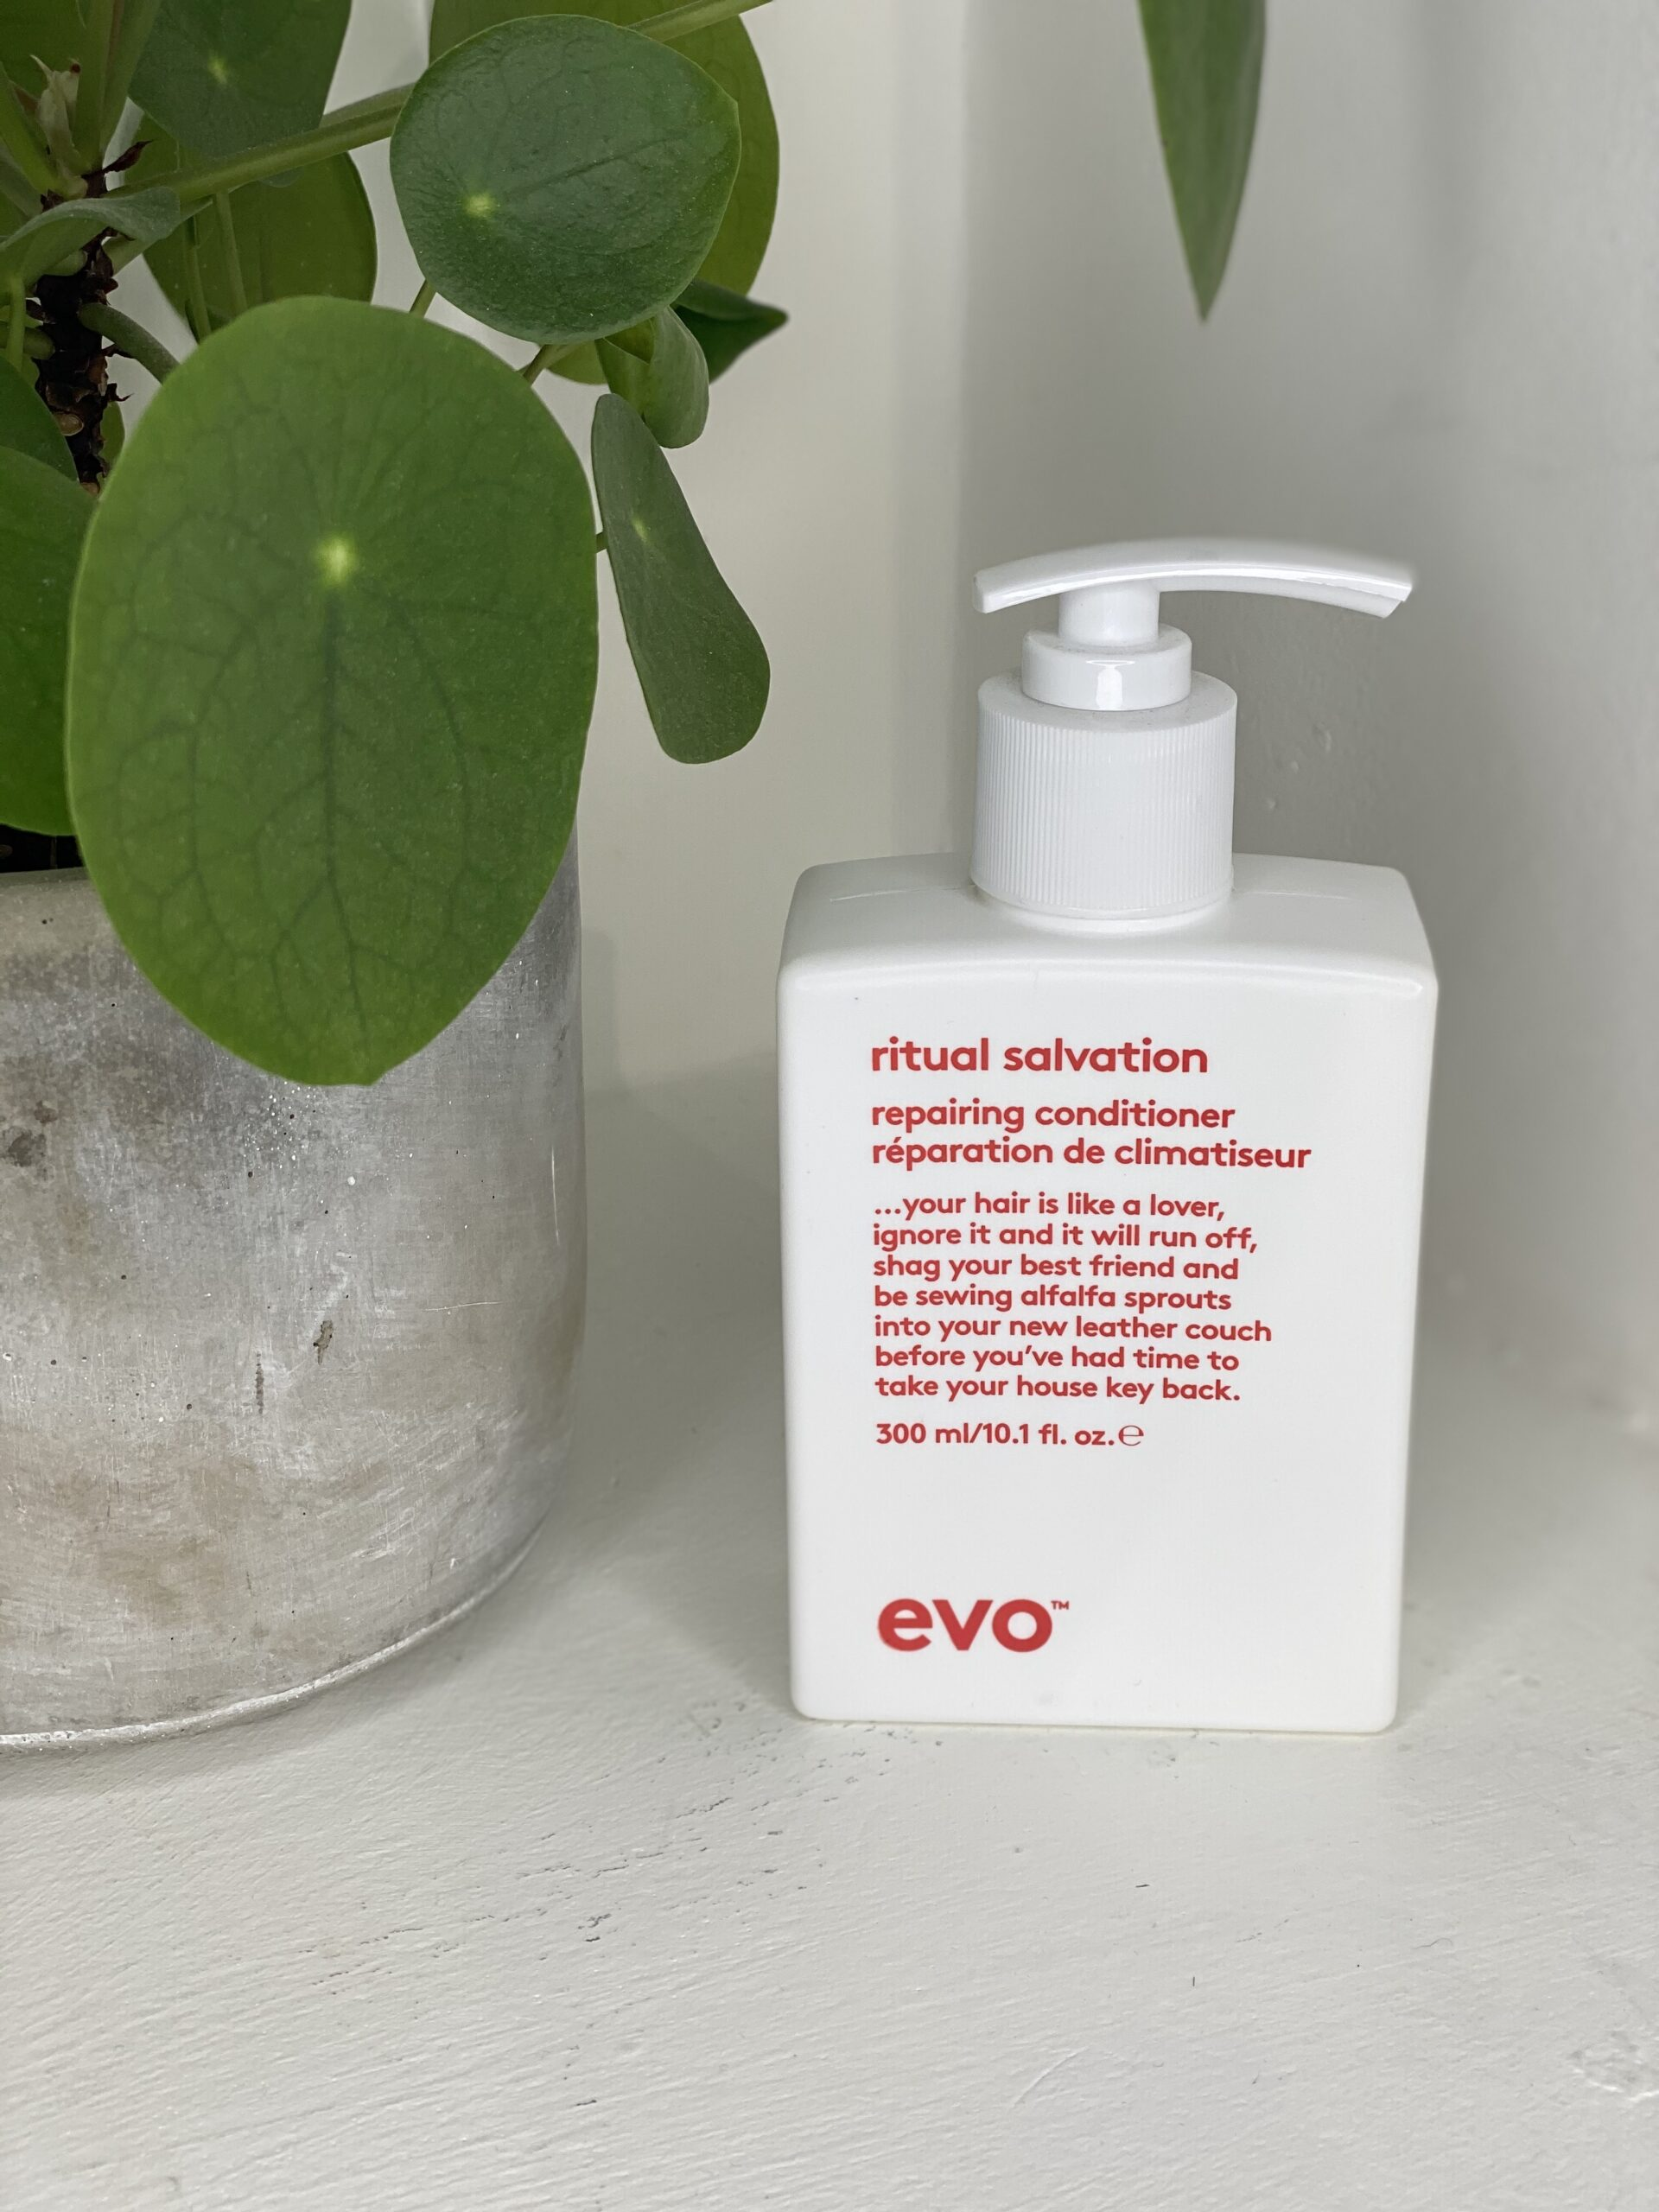 EVO Ritual Salvation